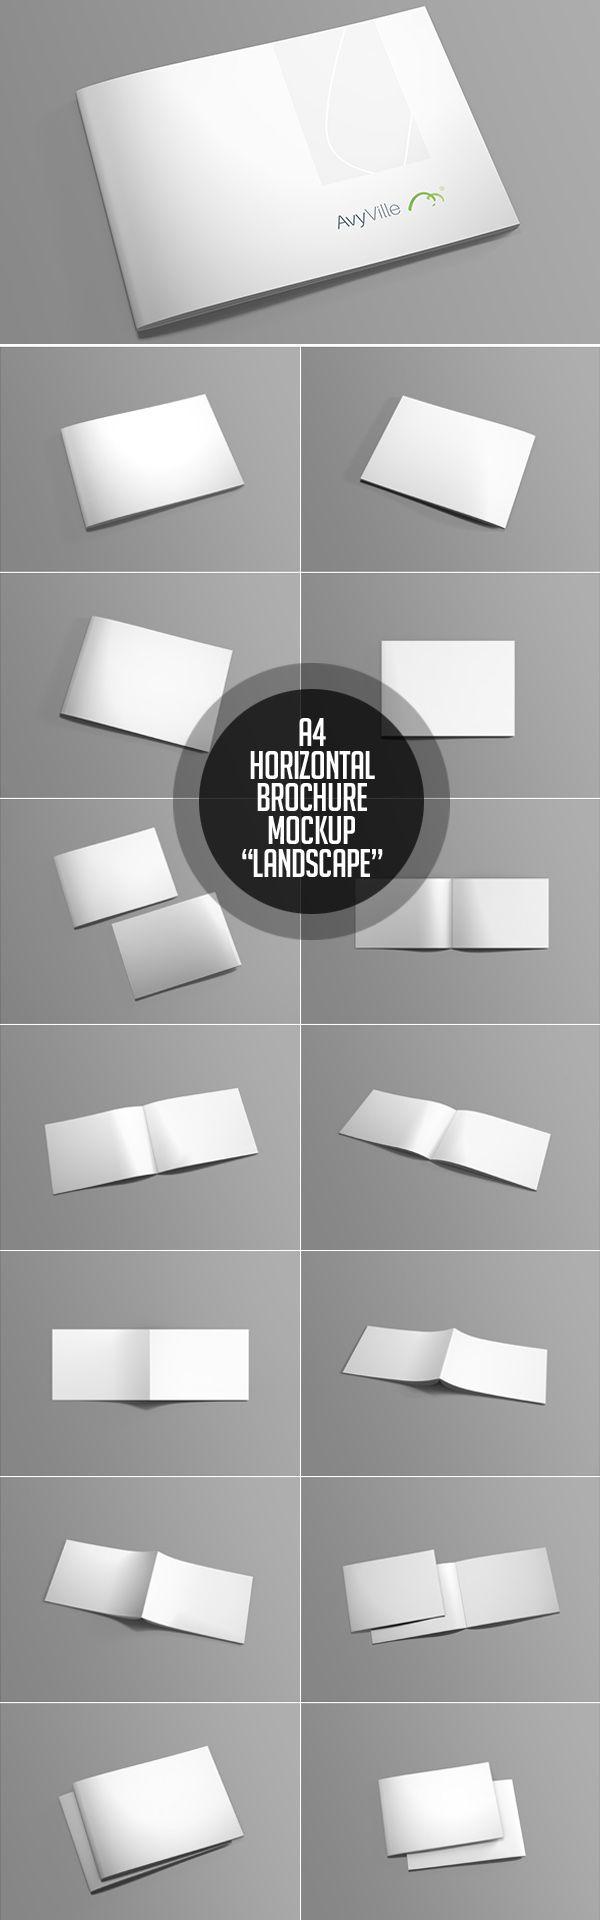 Free Landscape Brochure PSD Mockup #freepsdfiles #freepsdmockups #psdtemplate #freebies #presentationmockups